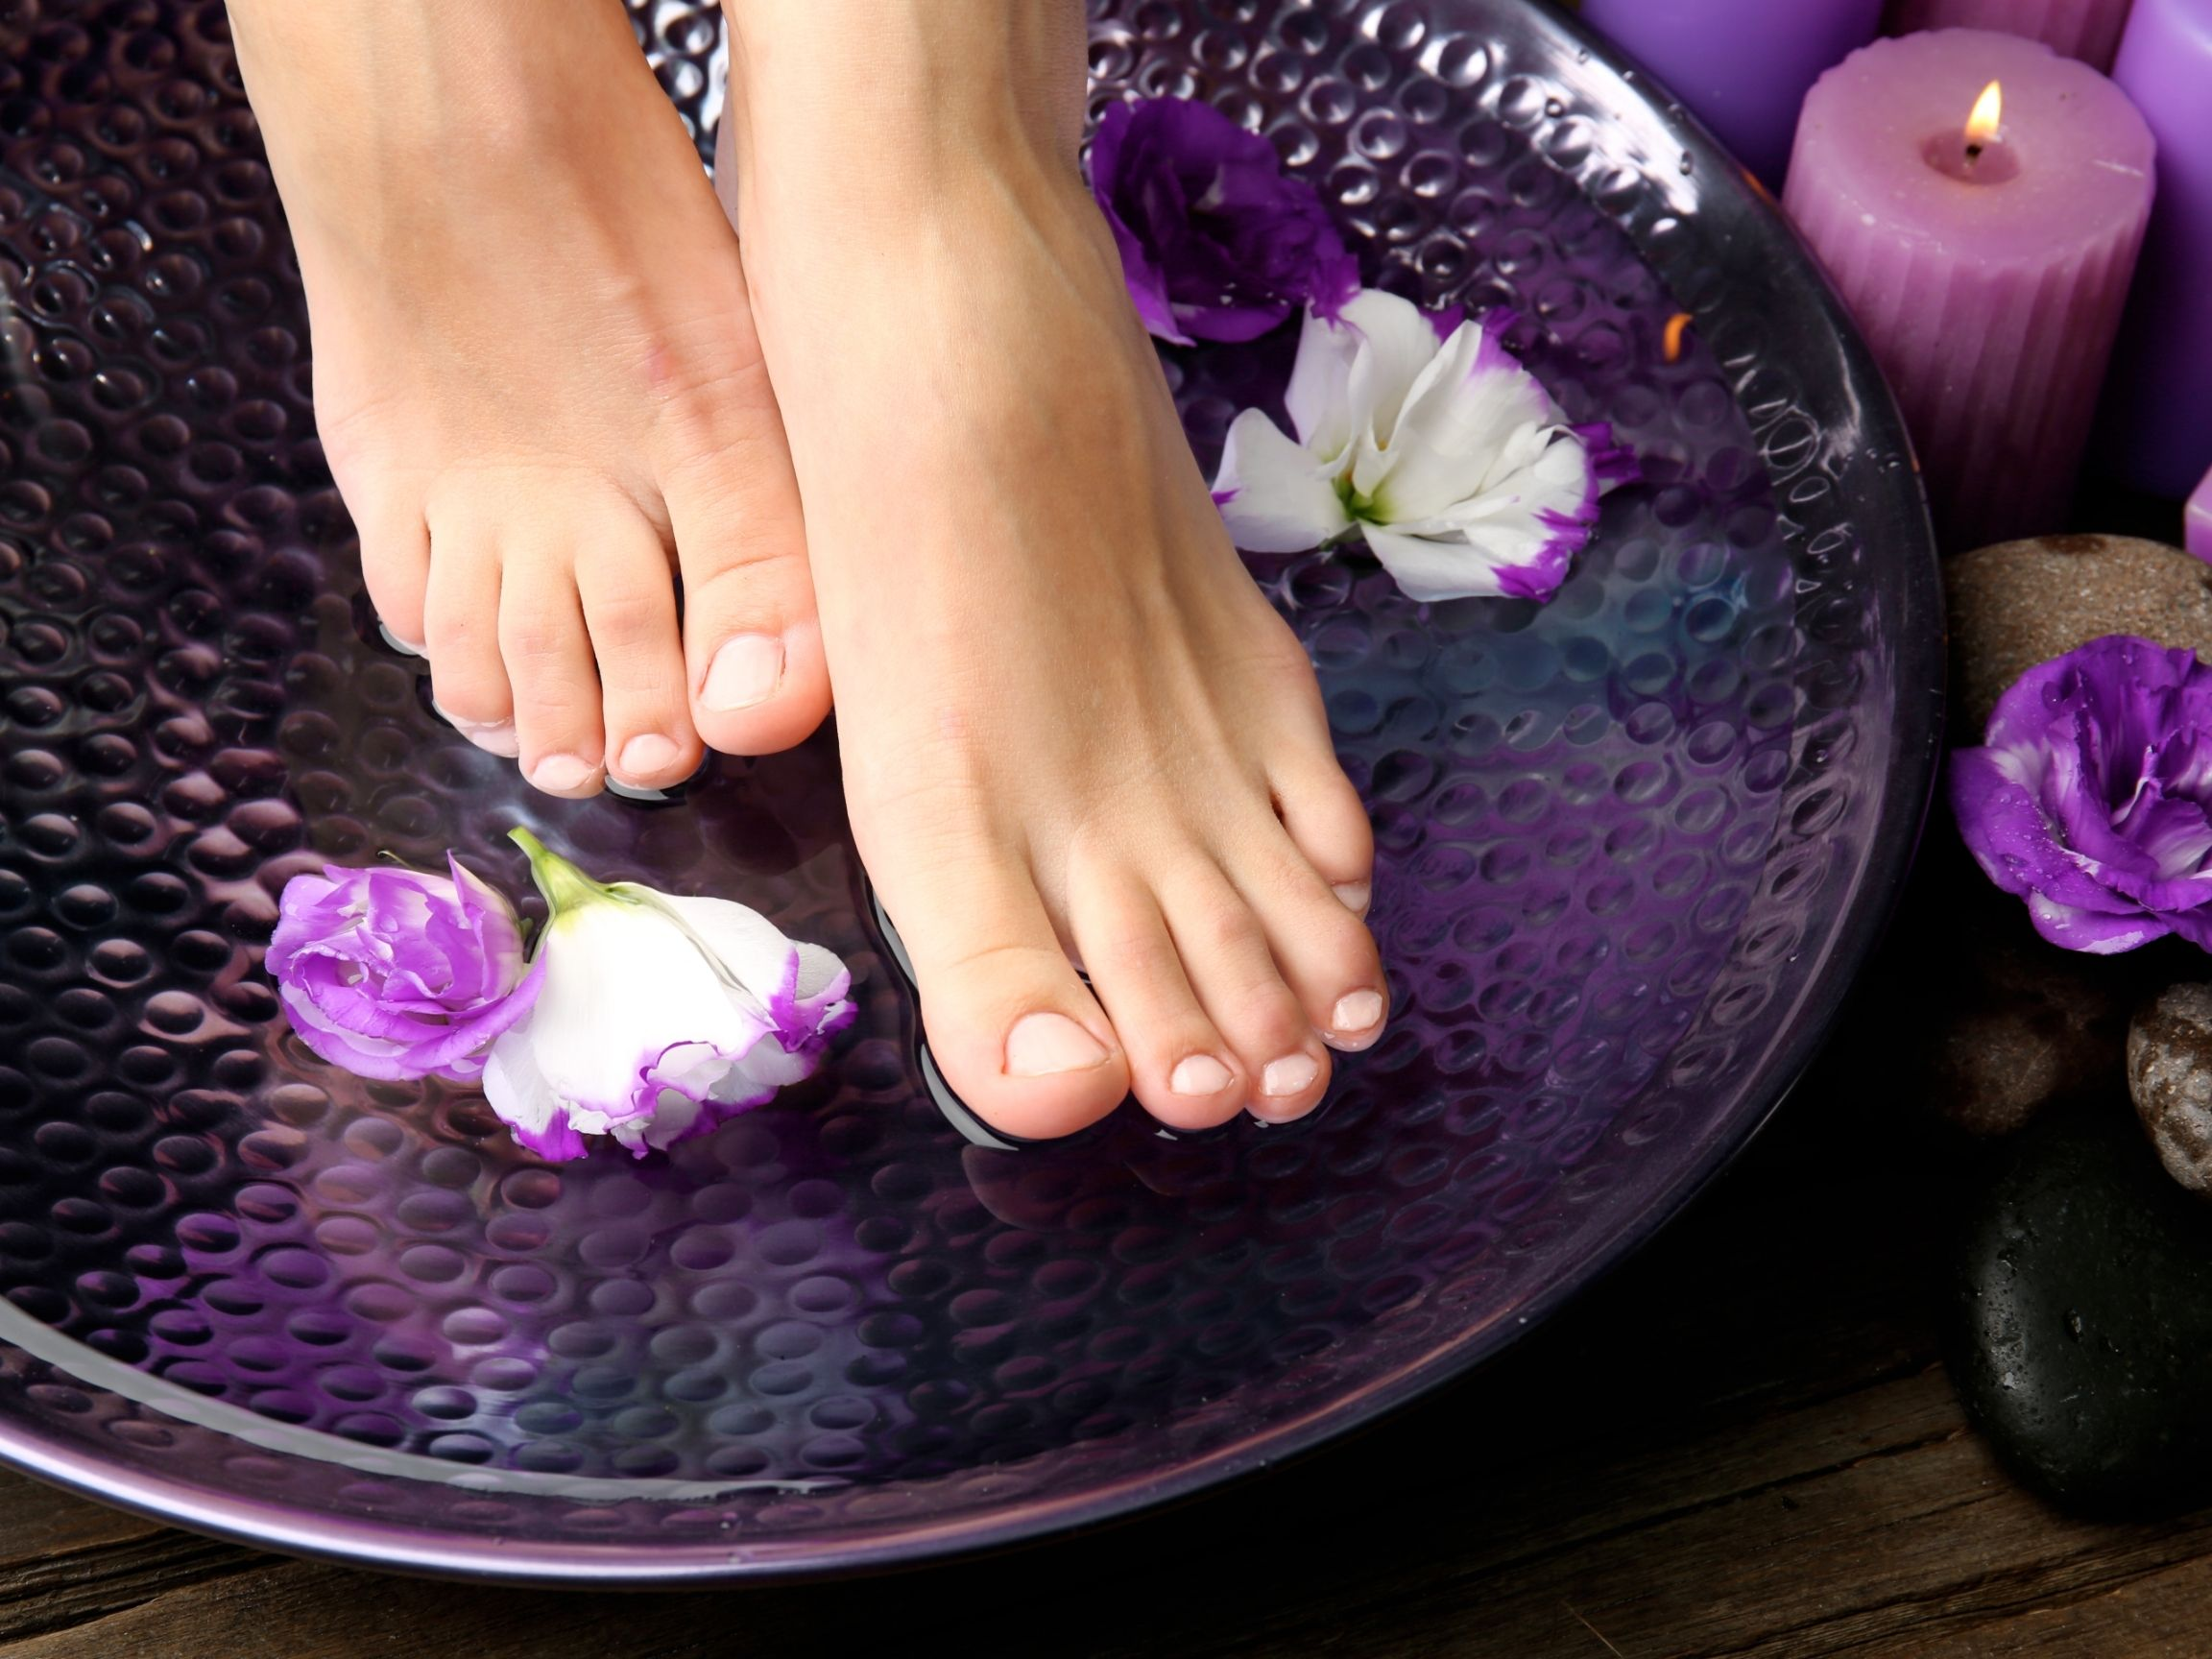 remove dead skin on feet